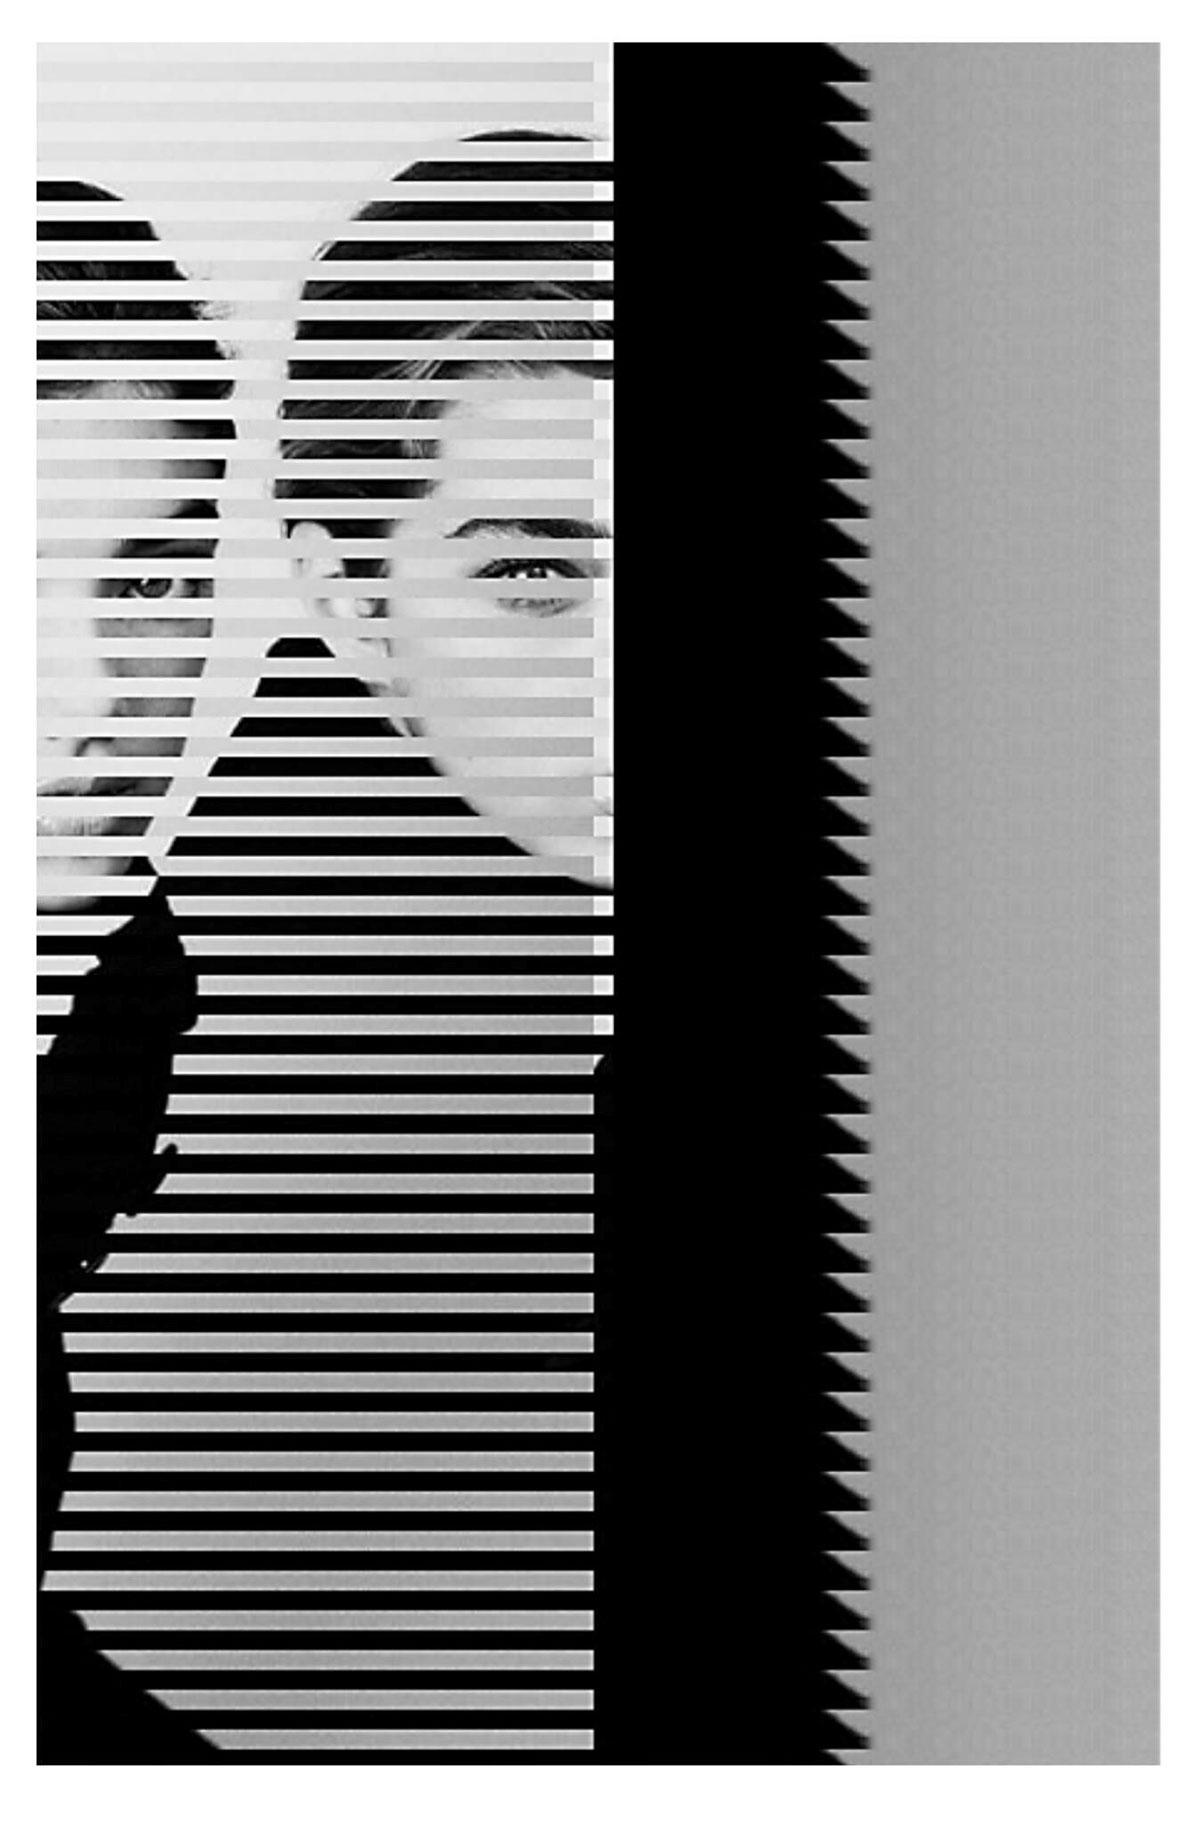 INTROSPECTO | Glitch art | Shalala Salamzadeh #artpeople